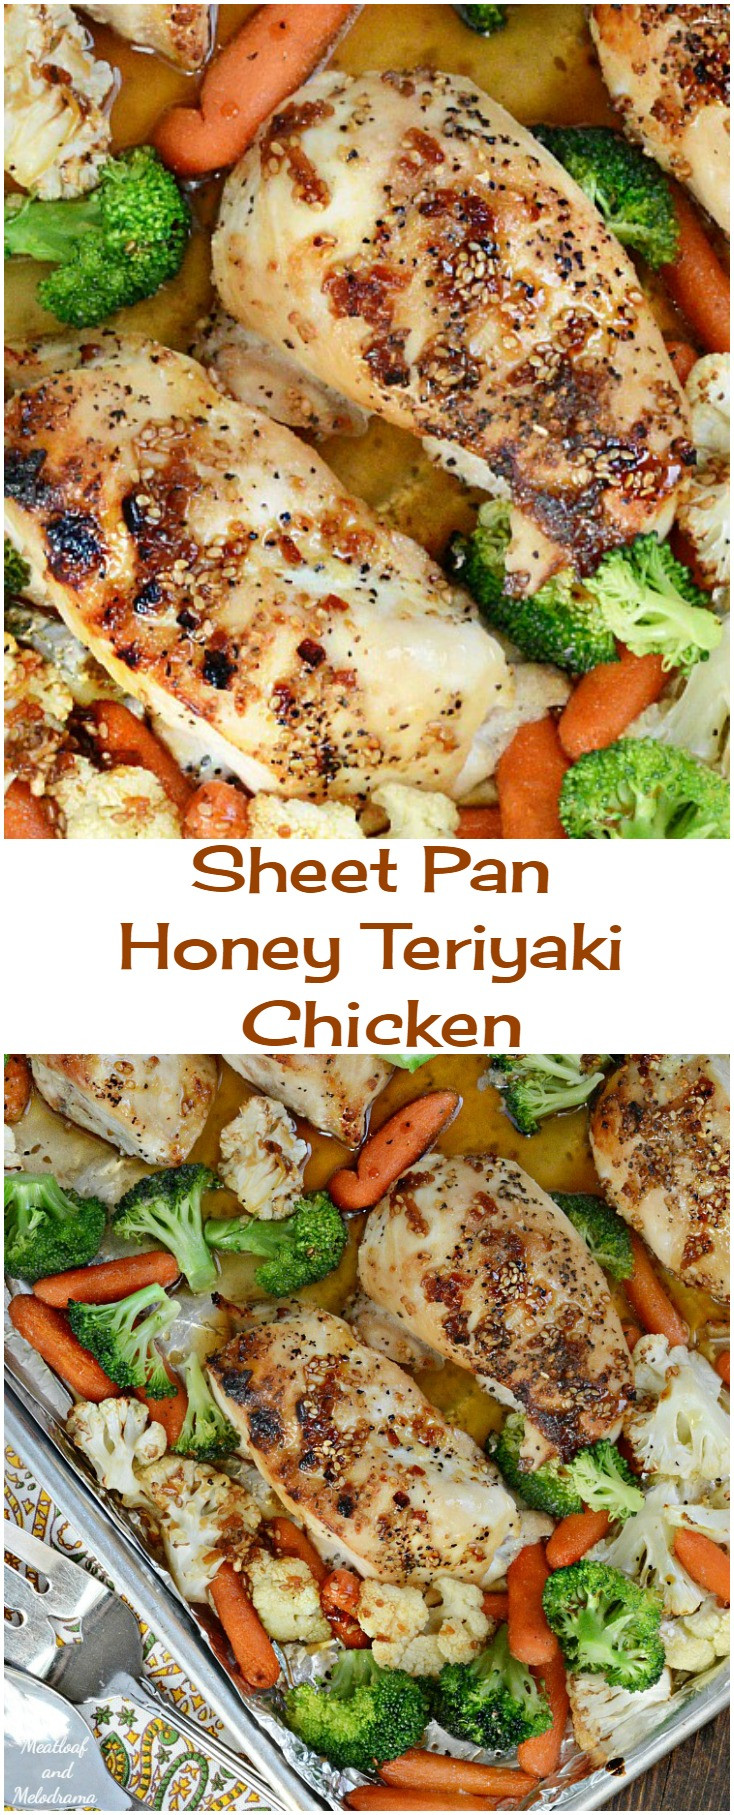 Sheet Pan Dinner Recipes  Sheet Pan Honey Teriyaki Chicken Meatloaf and Melodrama